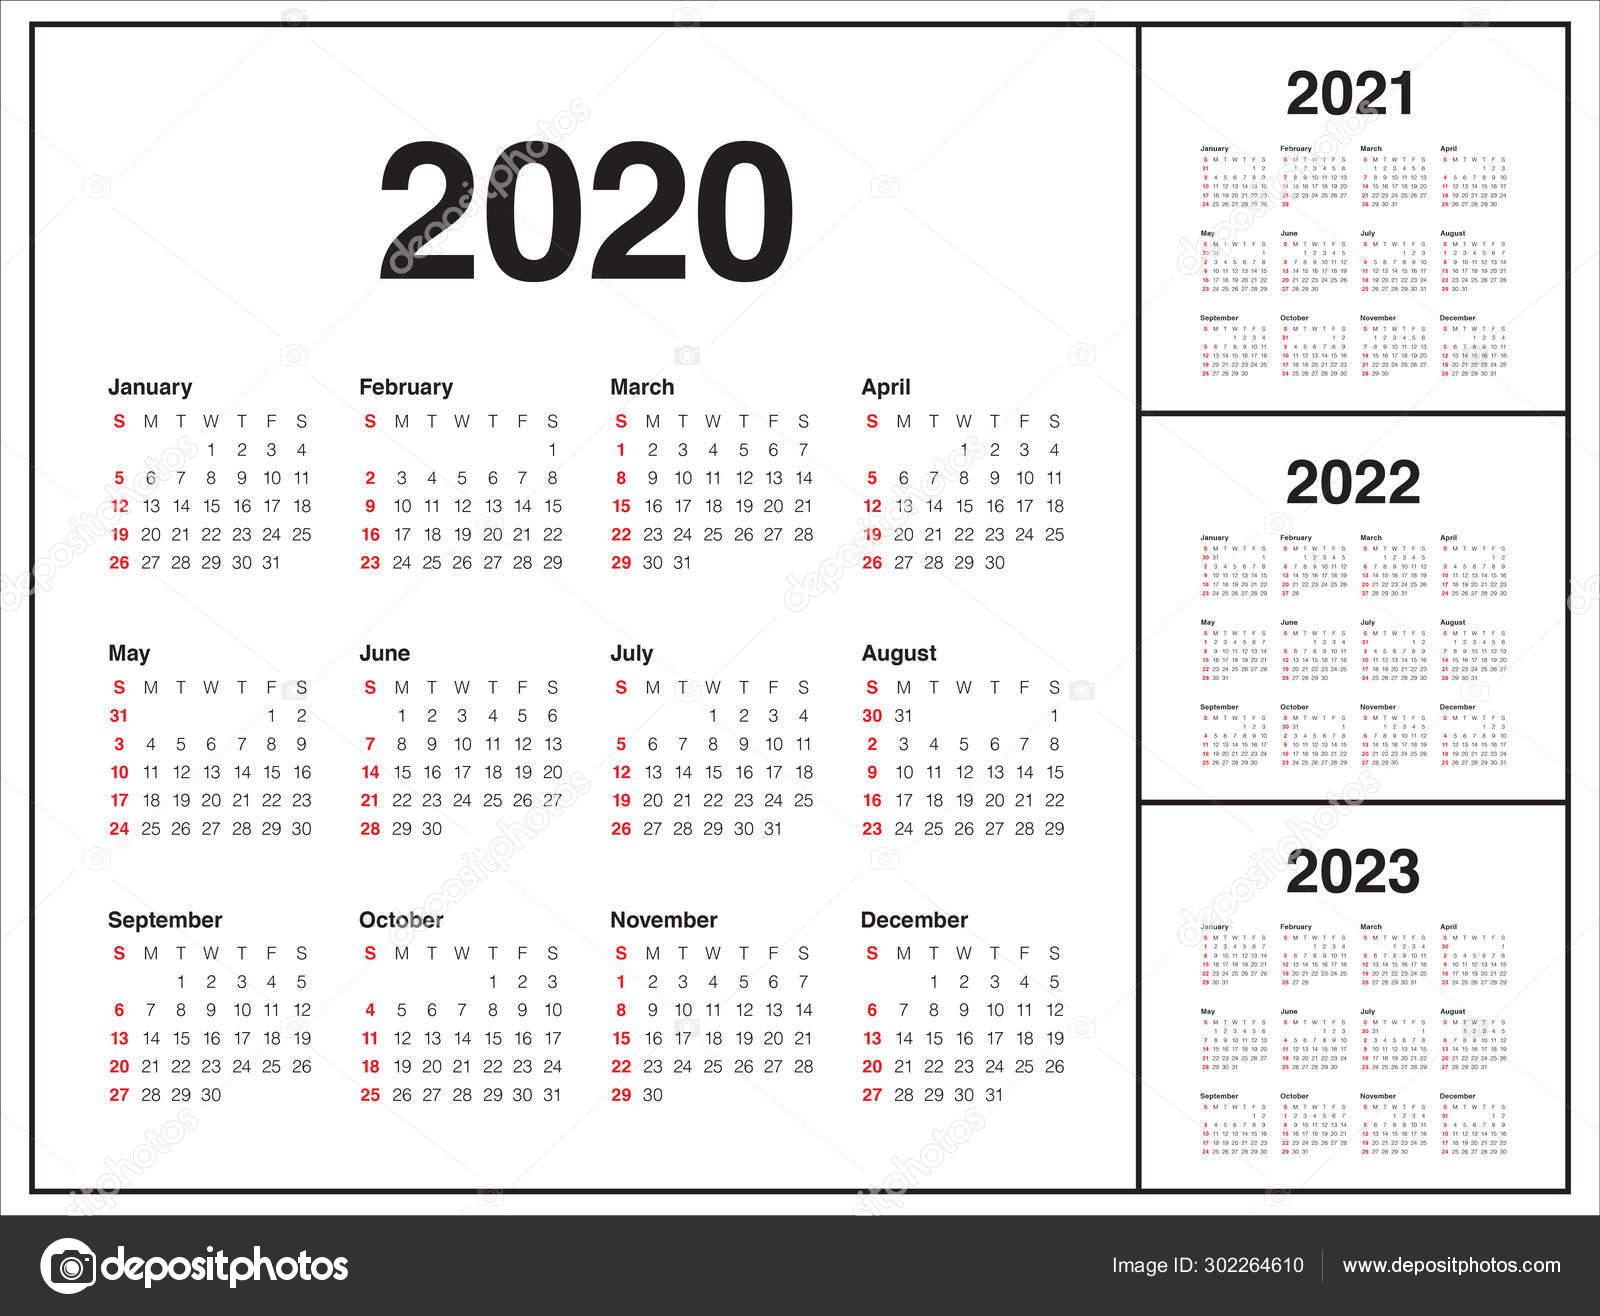 Year 2020 2021 2022 2023 Calendar Vector Design Template